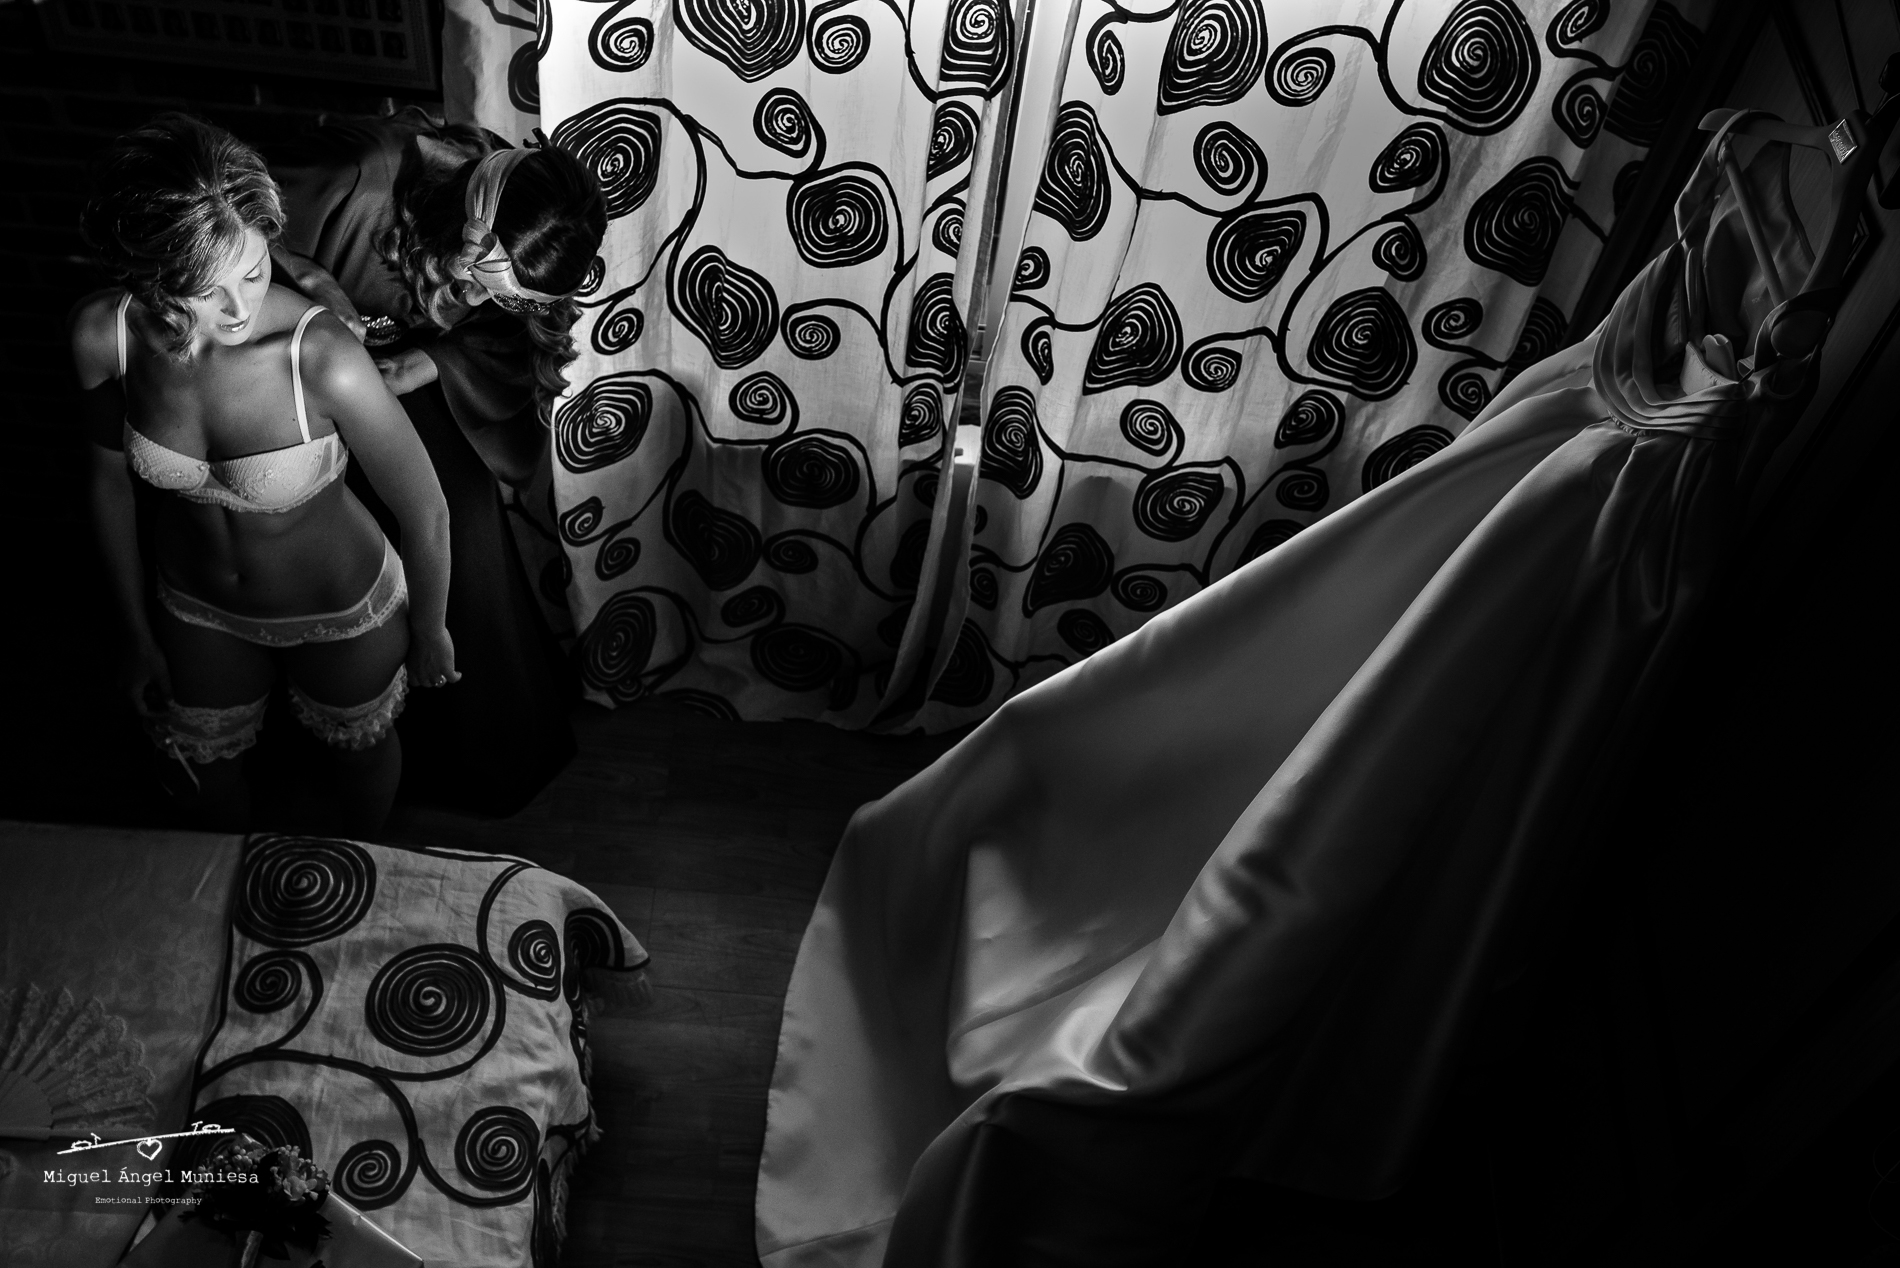 boda, fotografia de boda, boda zaragoza, fotografia, wedding, wedding photography, miguel angel muniesa, fotografo boda Zaragoza, fotografo boda, destination wedding_ 004